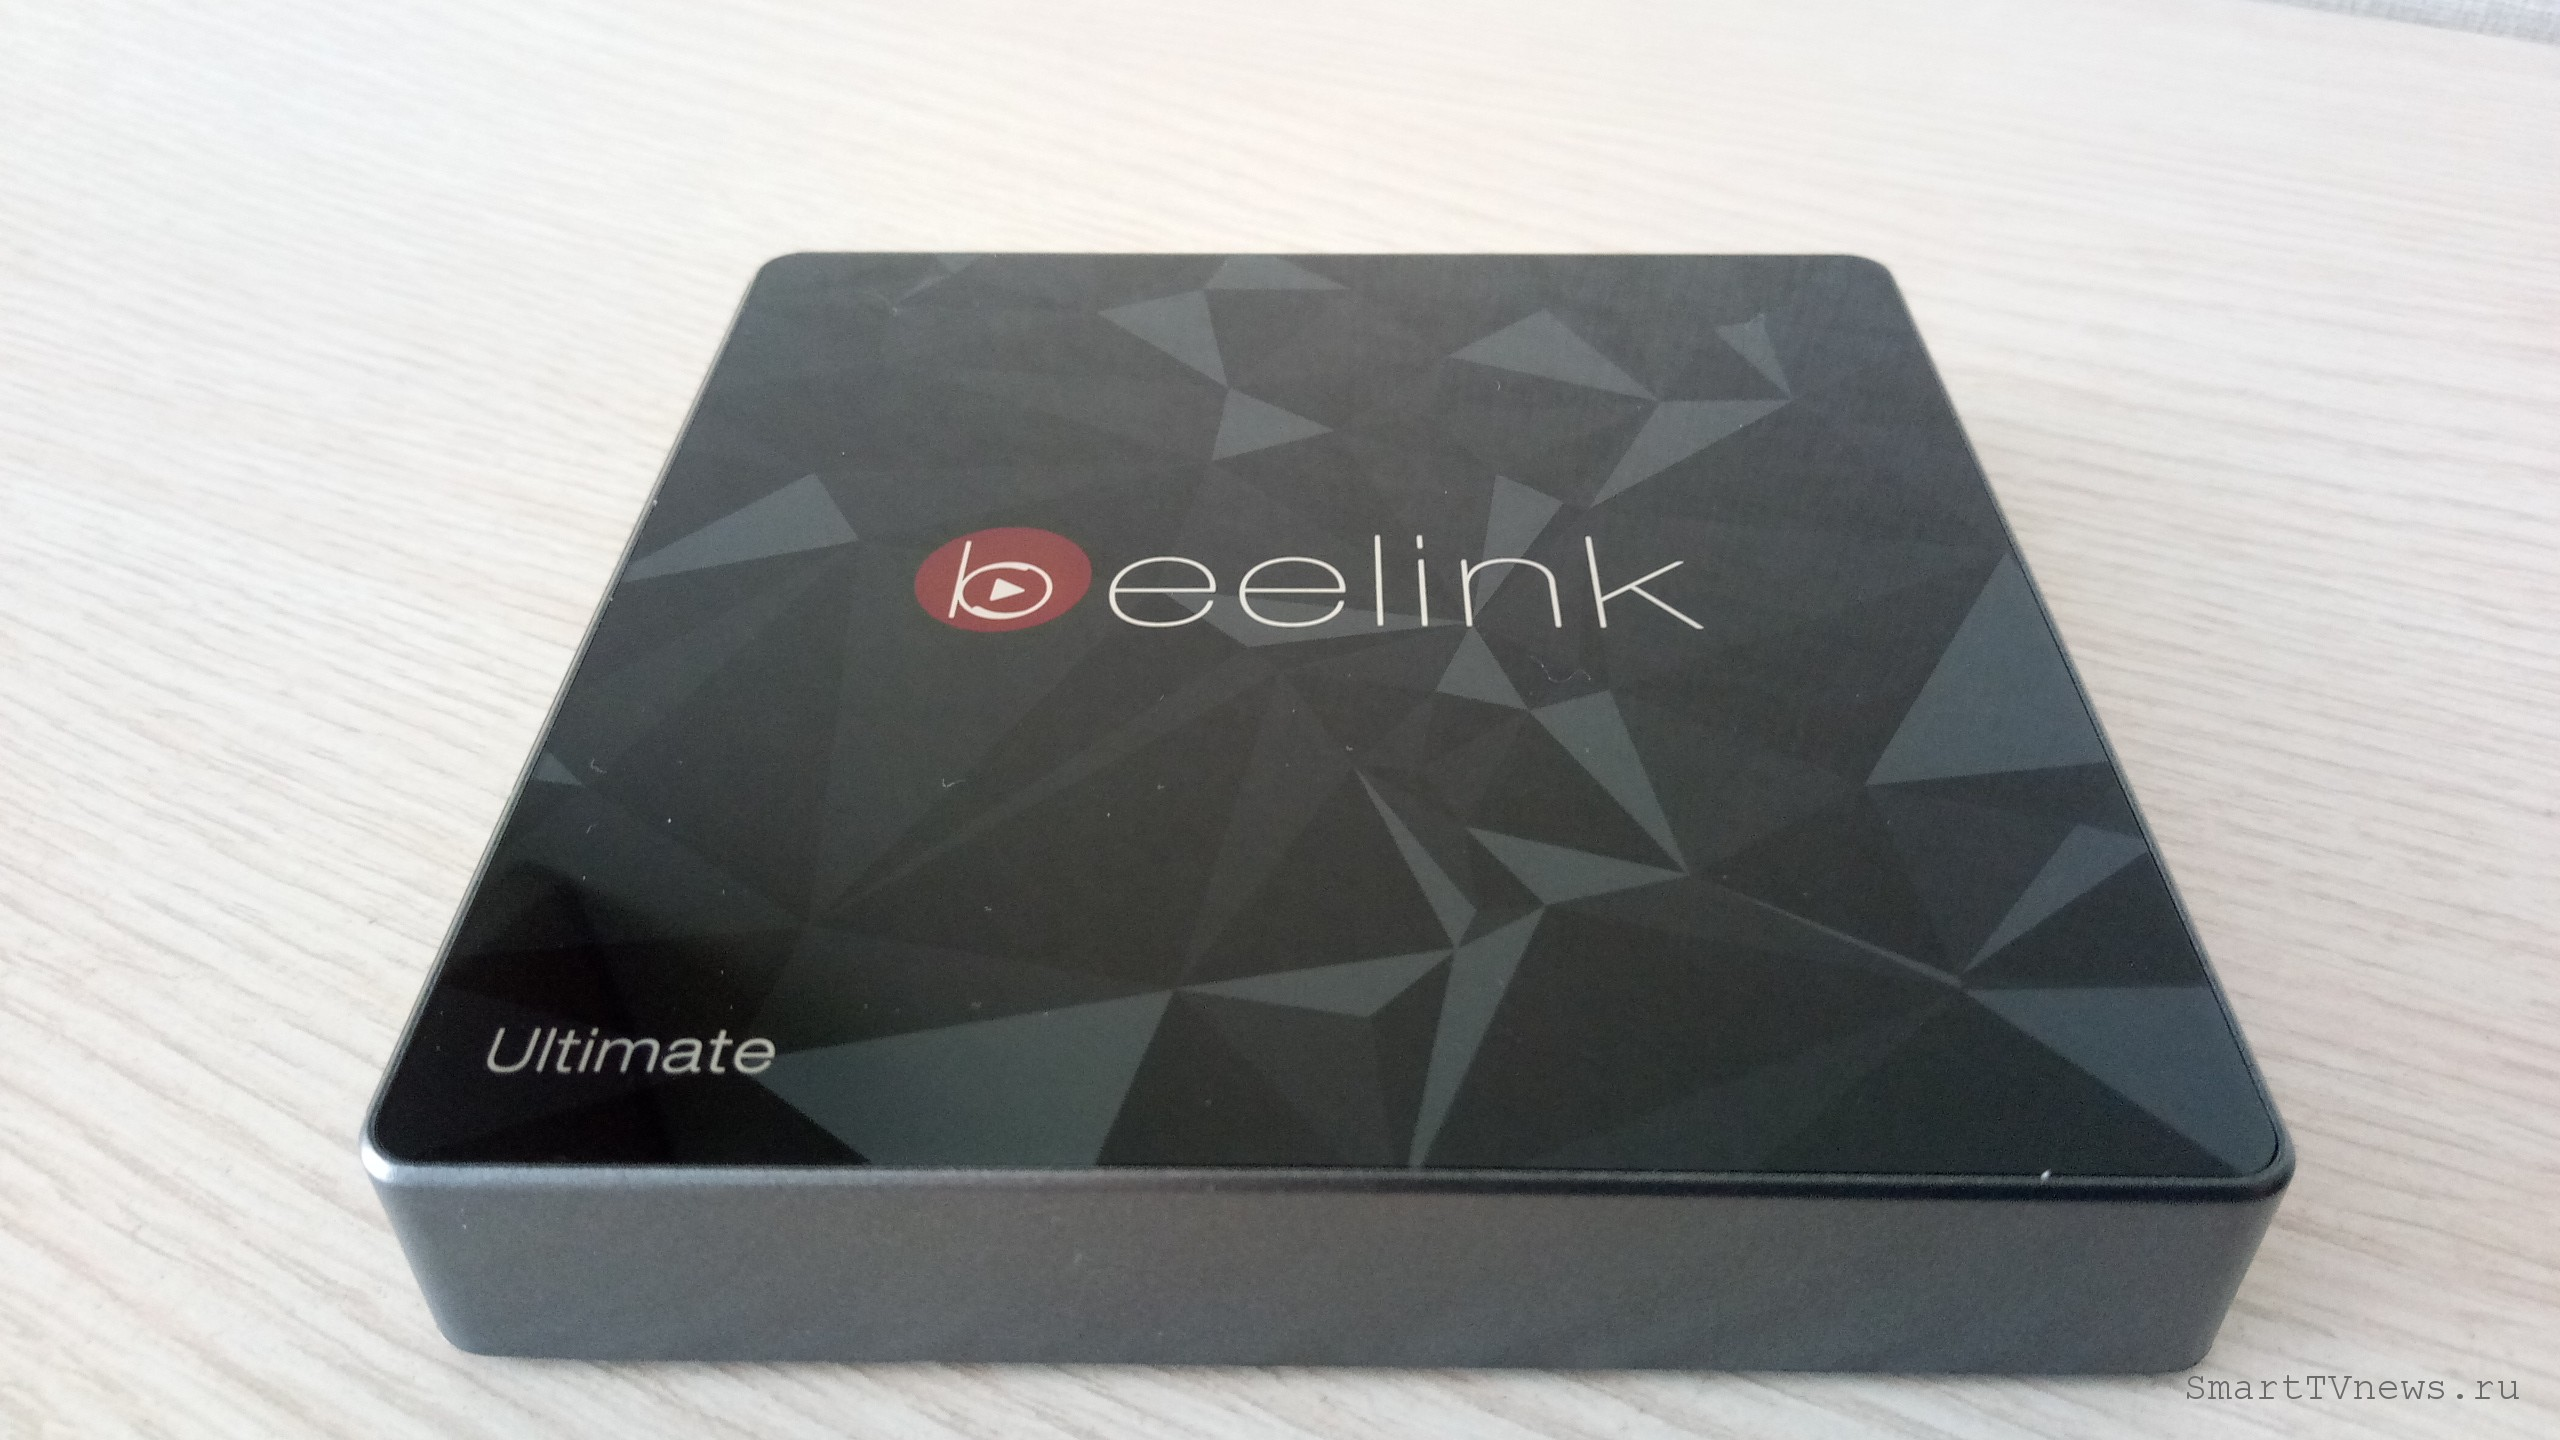 панель Beelink GT1 Ultimate